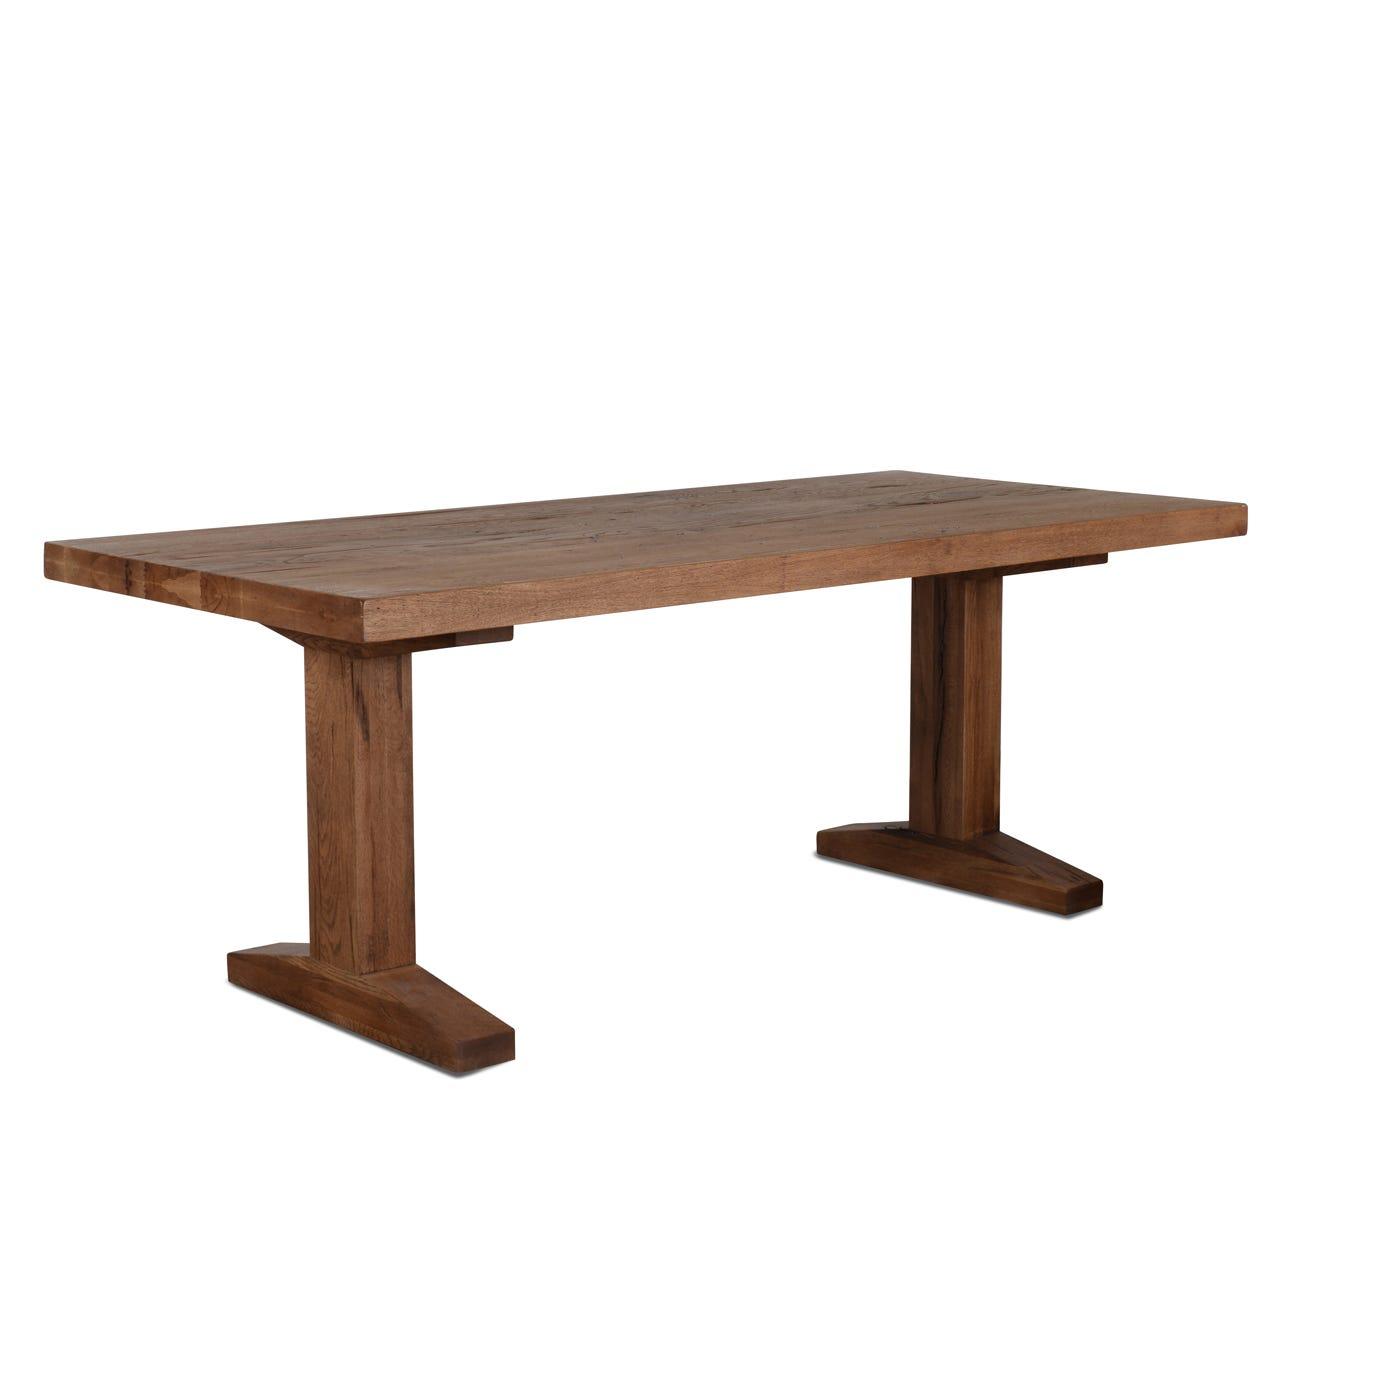 Tuscan Rustic Antique Wild Oak Table 200 x 90